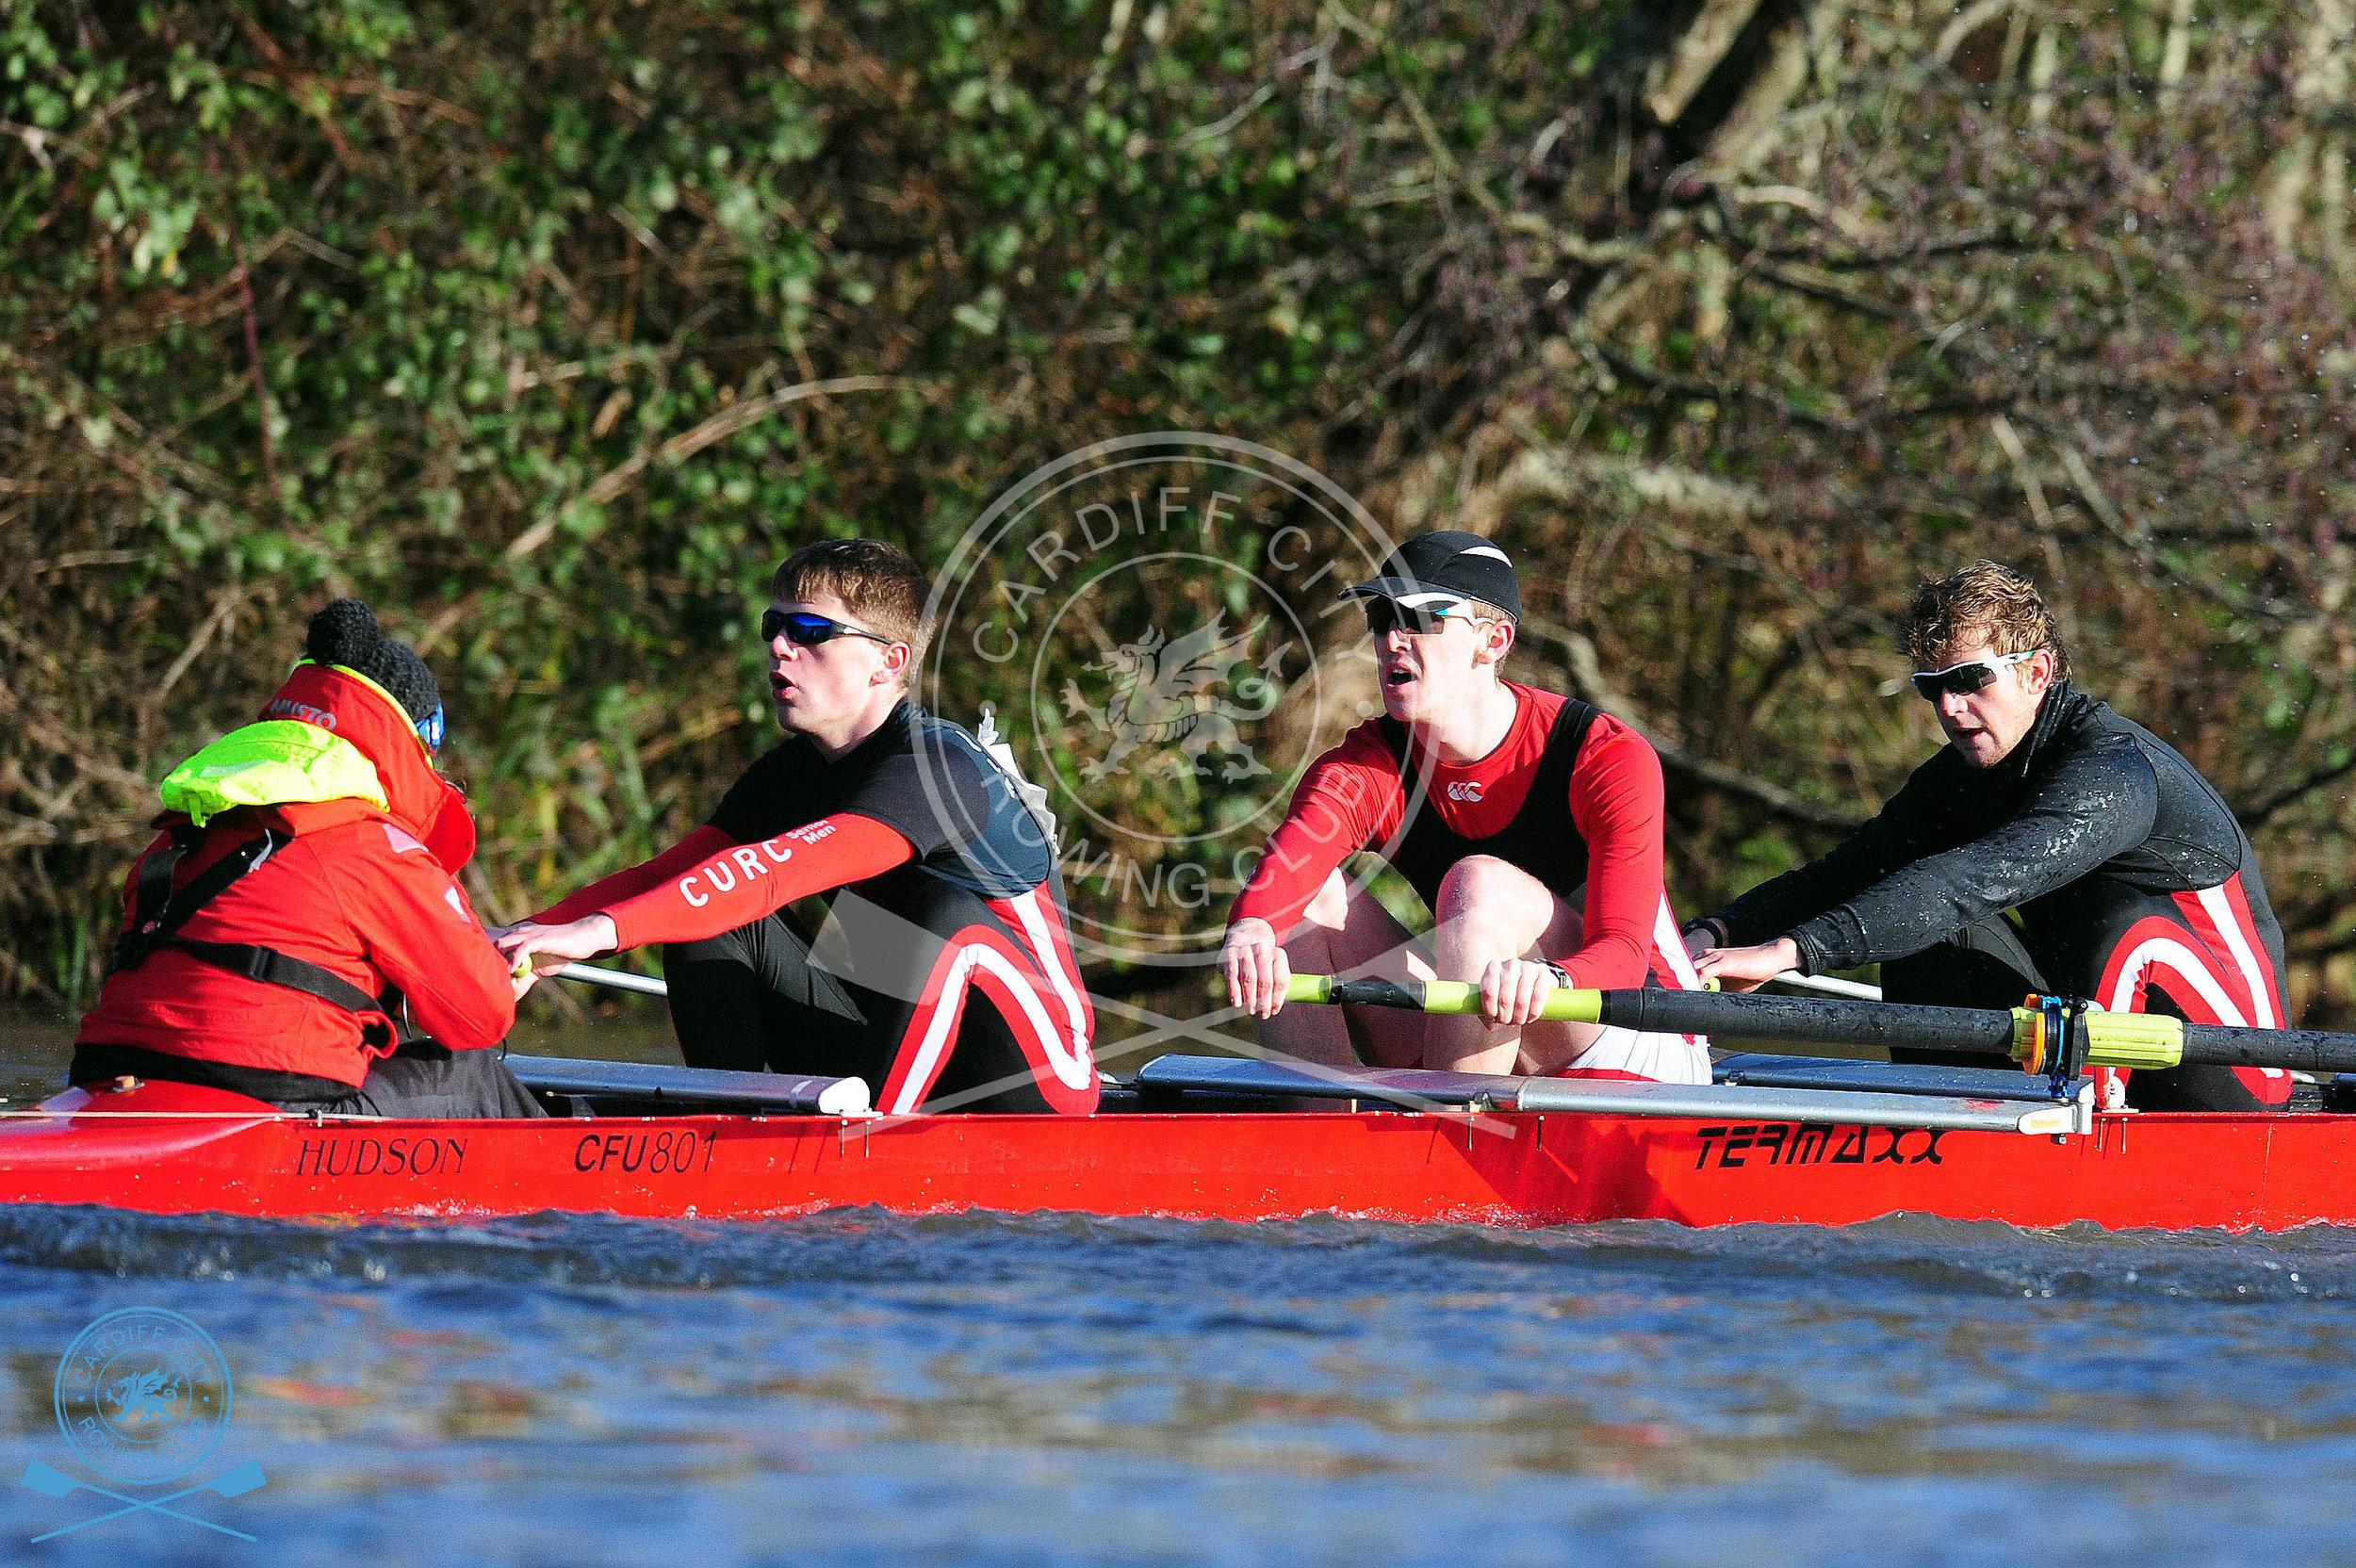 DW_280119_Cardiff_City_Rowing_228.jpg